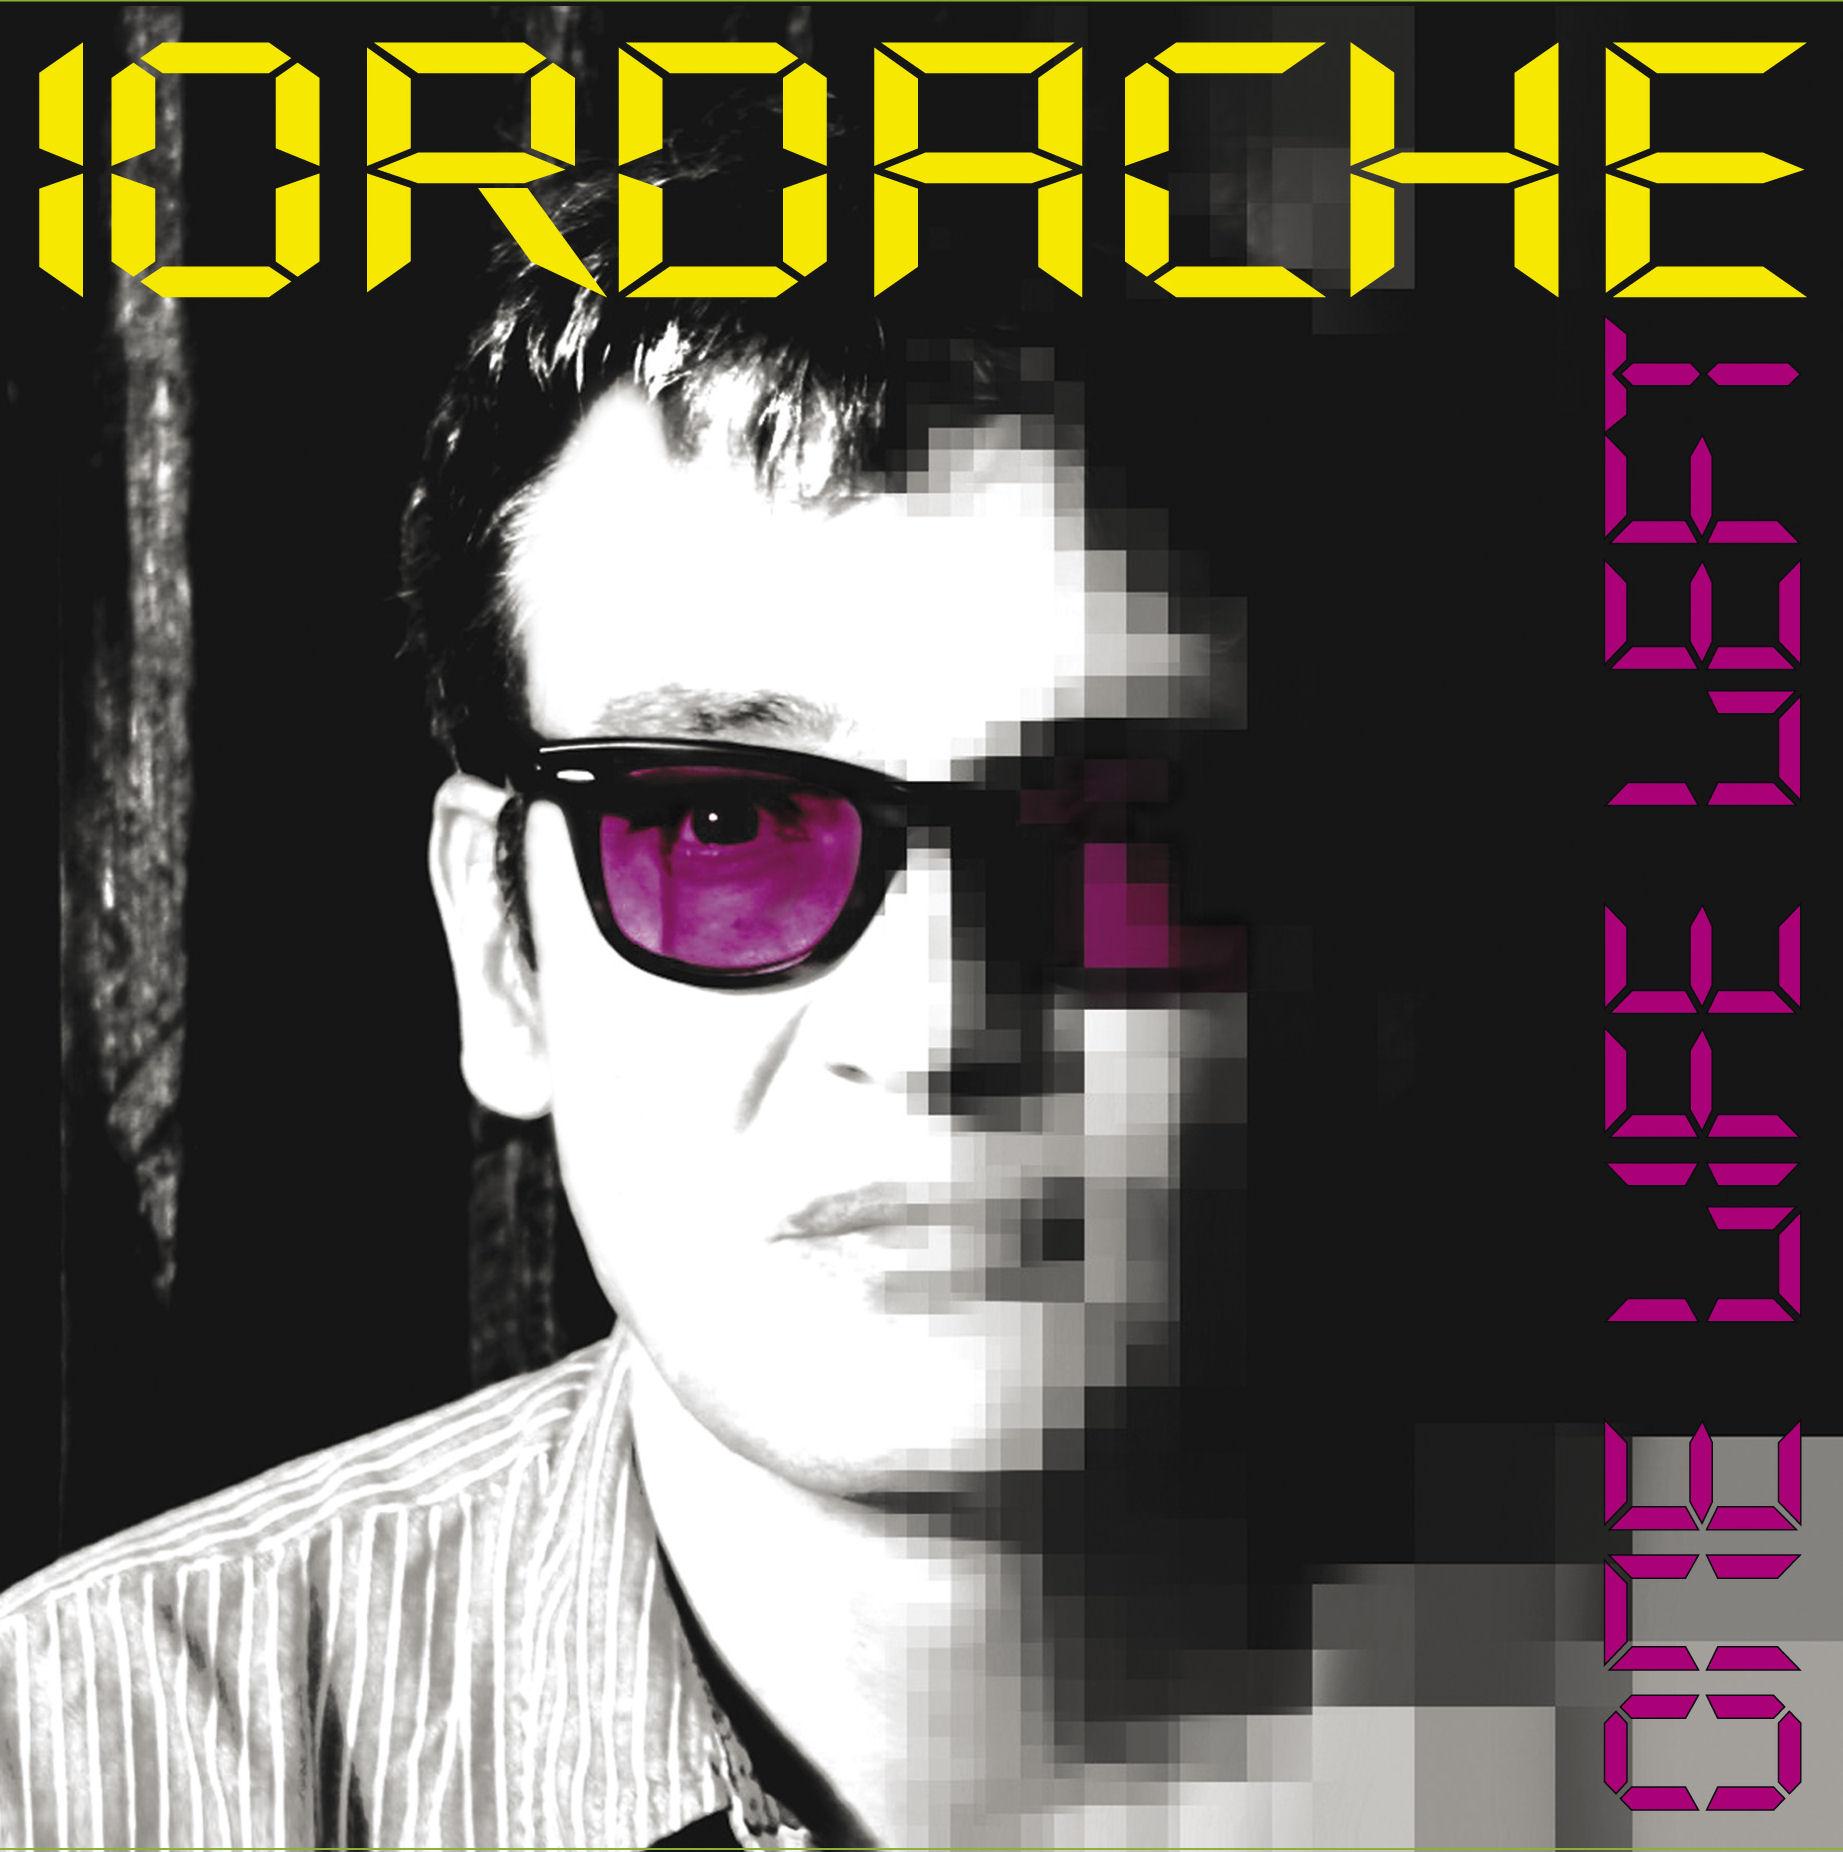 MIHAI IORDACHE - One Life Left cover